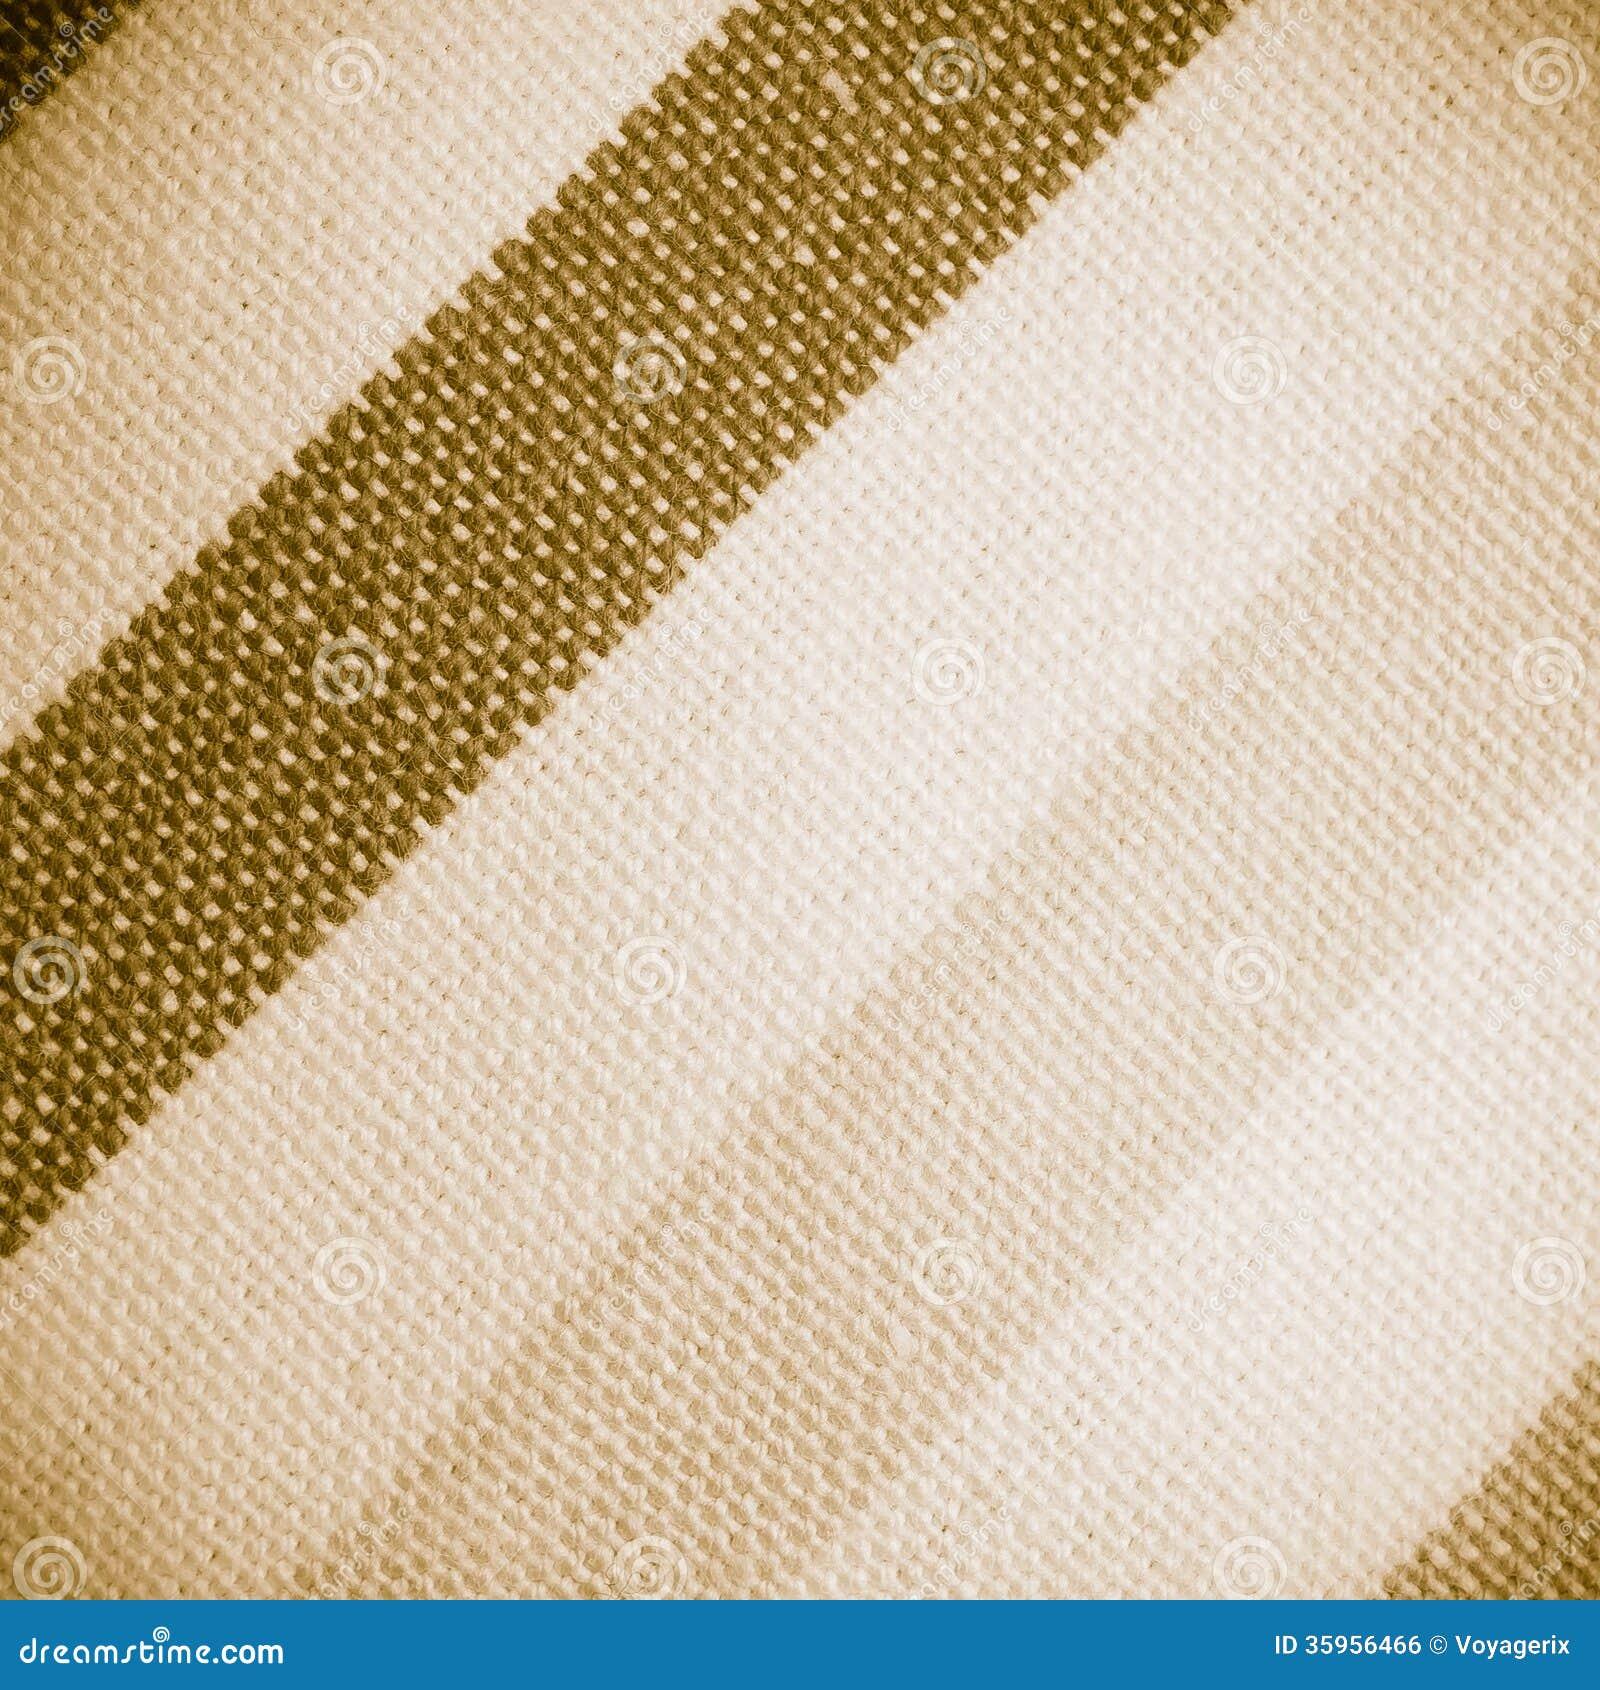 Primer de la materia textil rayada colorida como fondo o textura